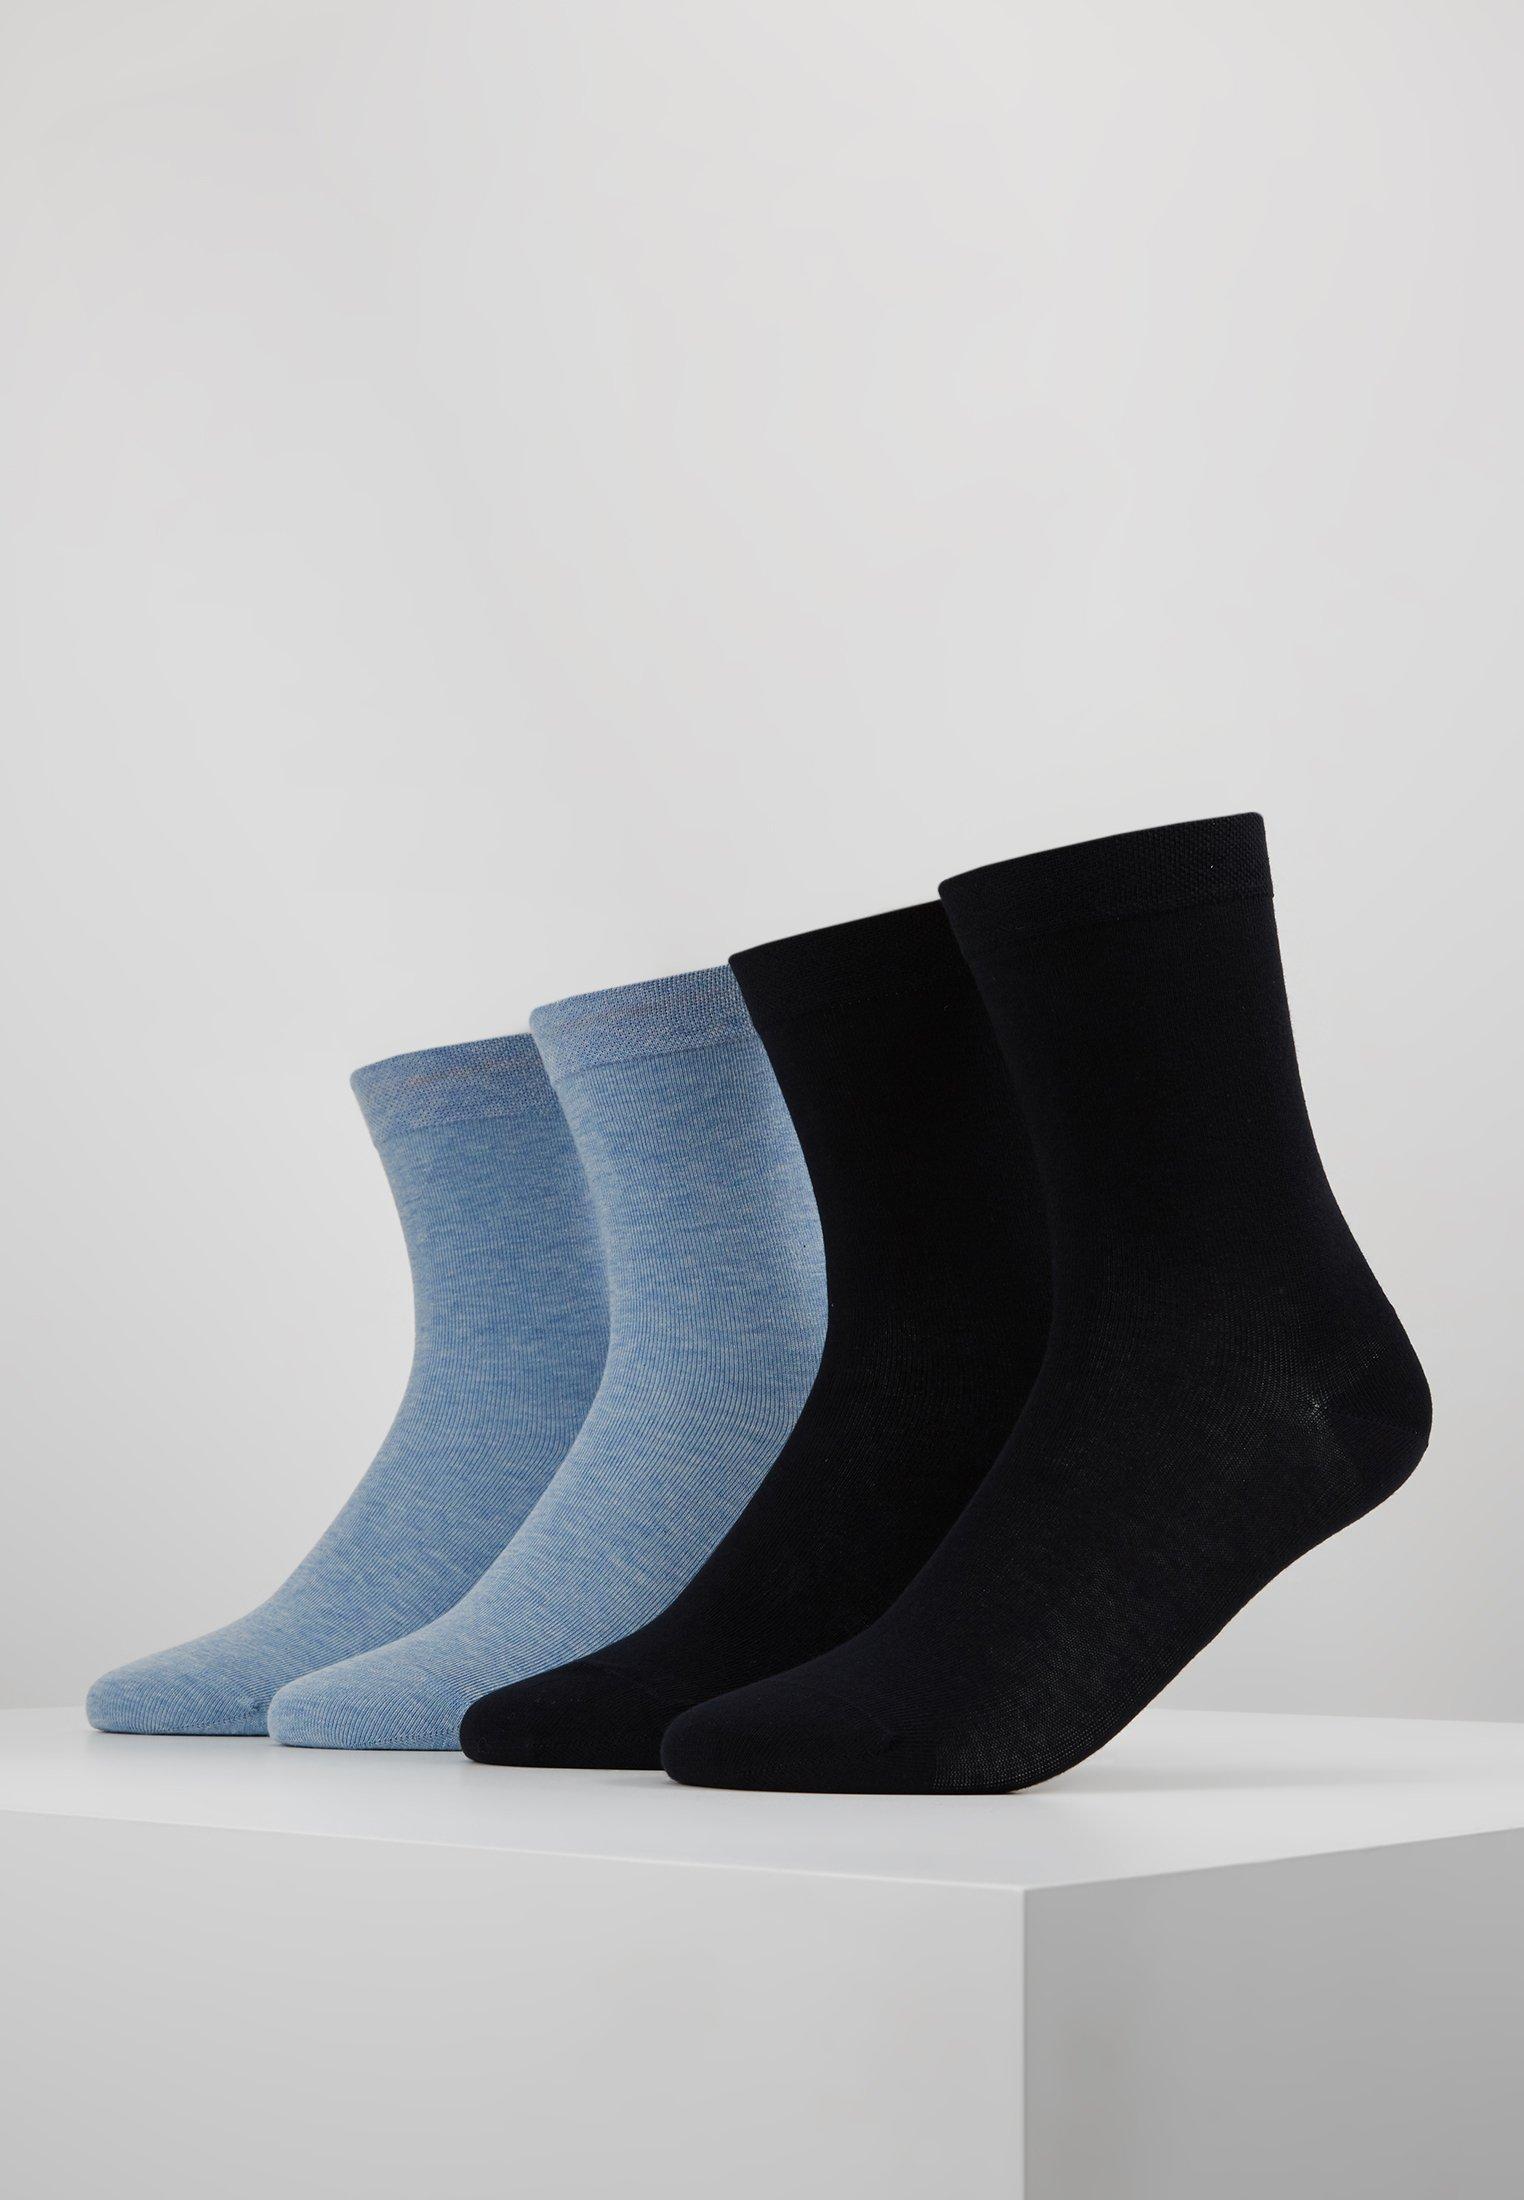 Femme SOFT SOCKS 4 PACK - Chaussettes